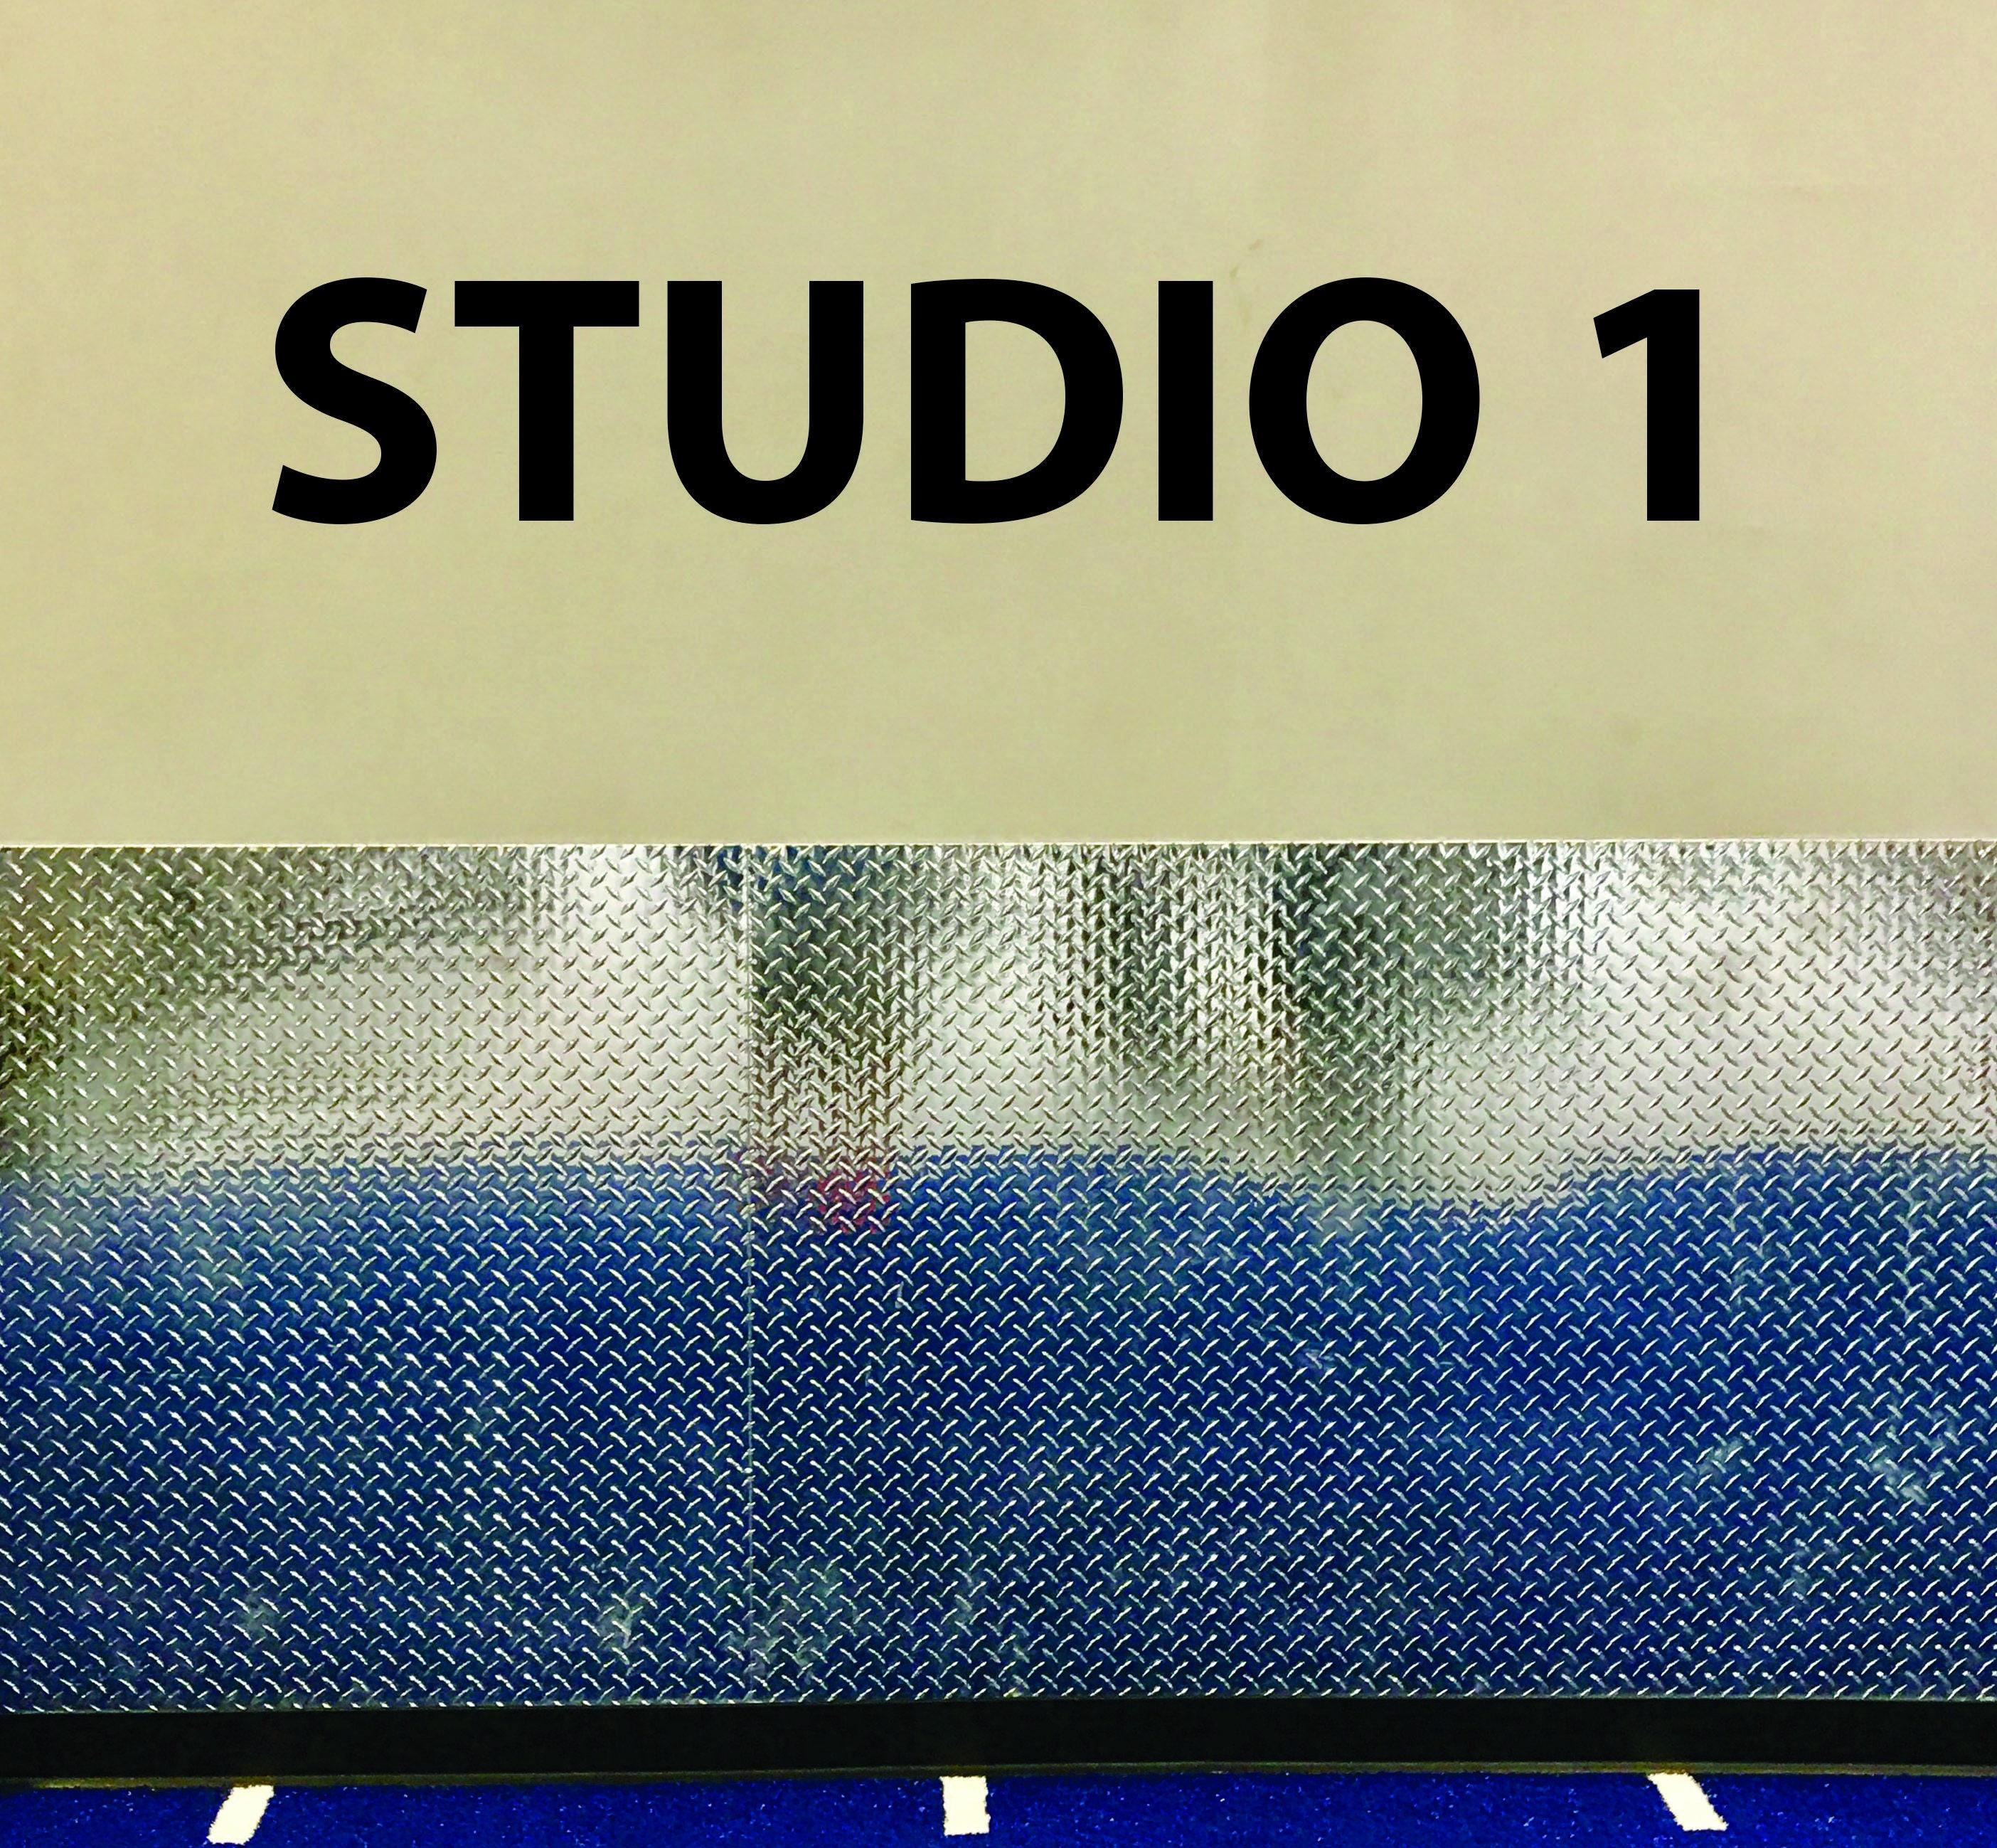 Fitness Studio Classroom Decor, Studio Sign, Gym Sign, Classroom ...